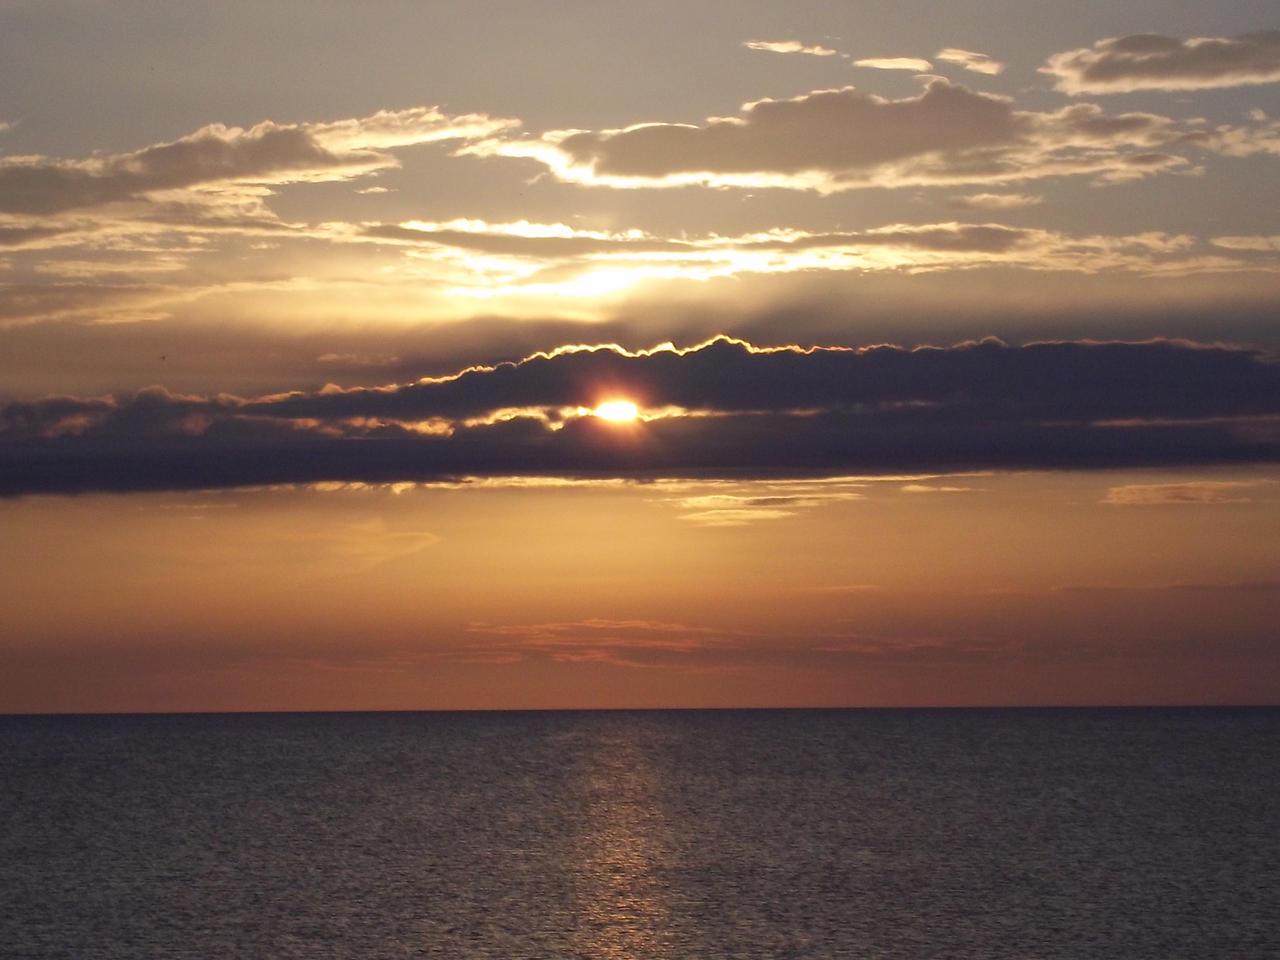 Sunset at the Baltic Sea 2 by Sabbelbina